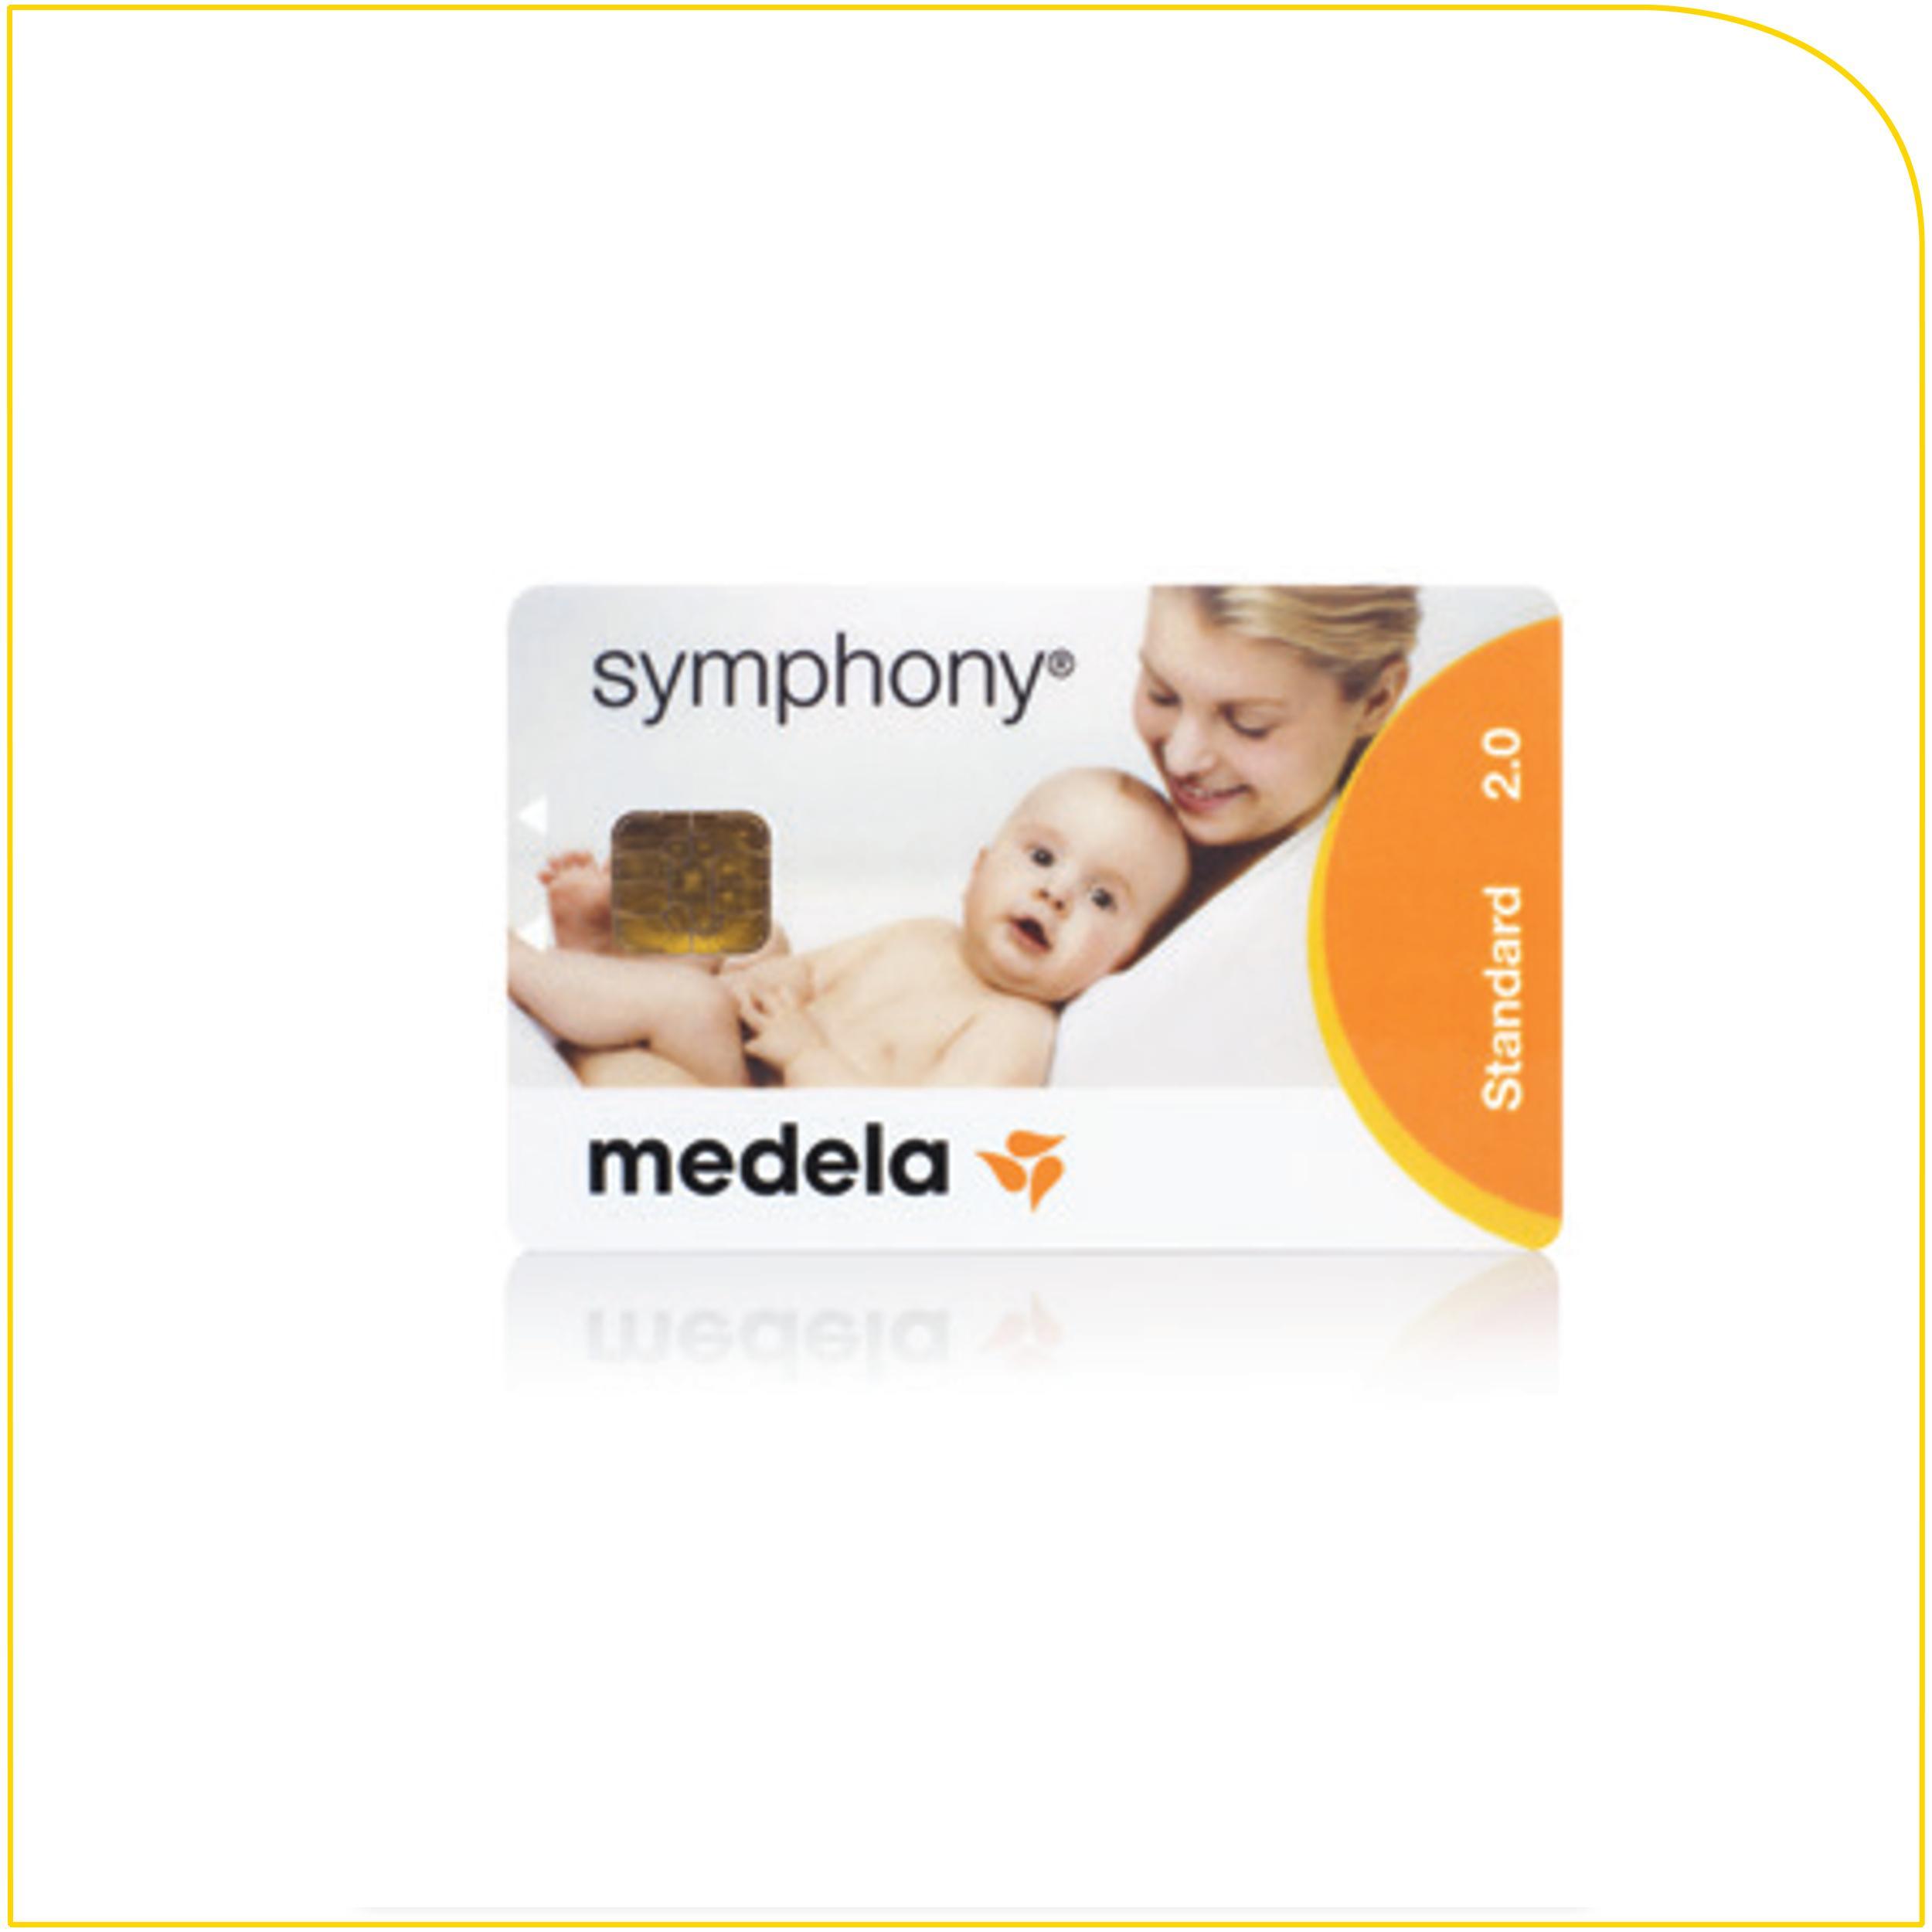 Amazoncom  Medela Symphony Breast Pump, Hospital Grade -5547